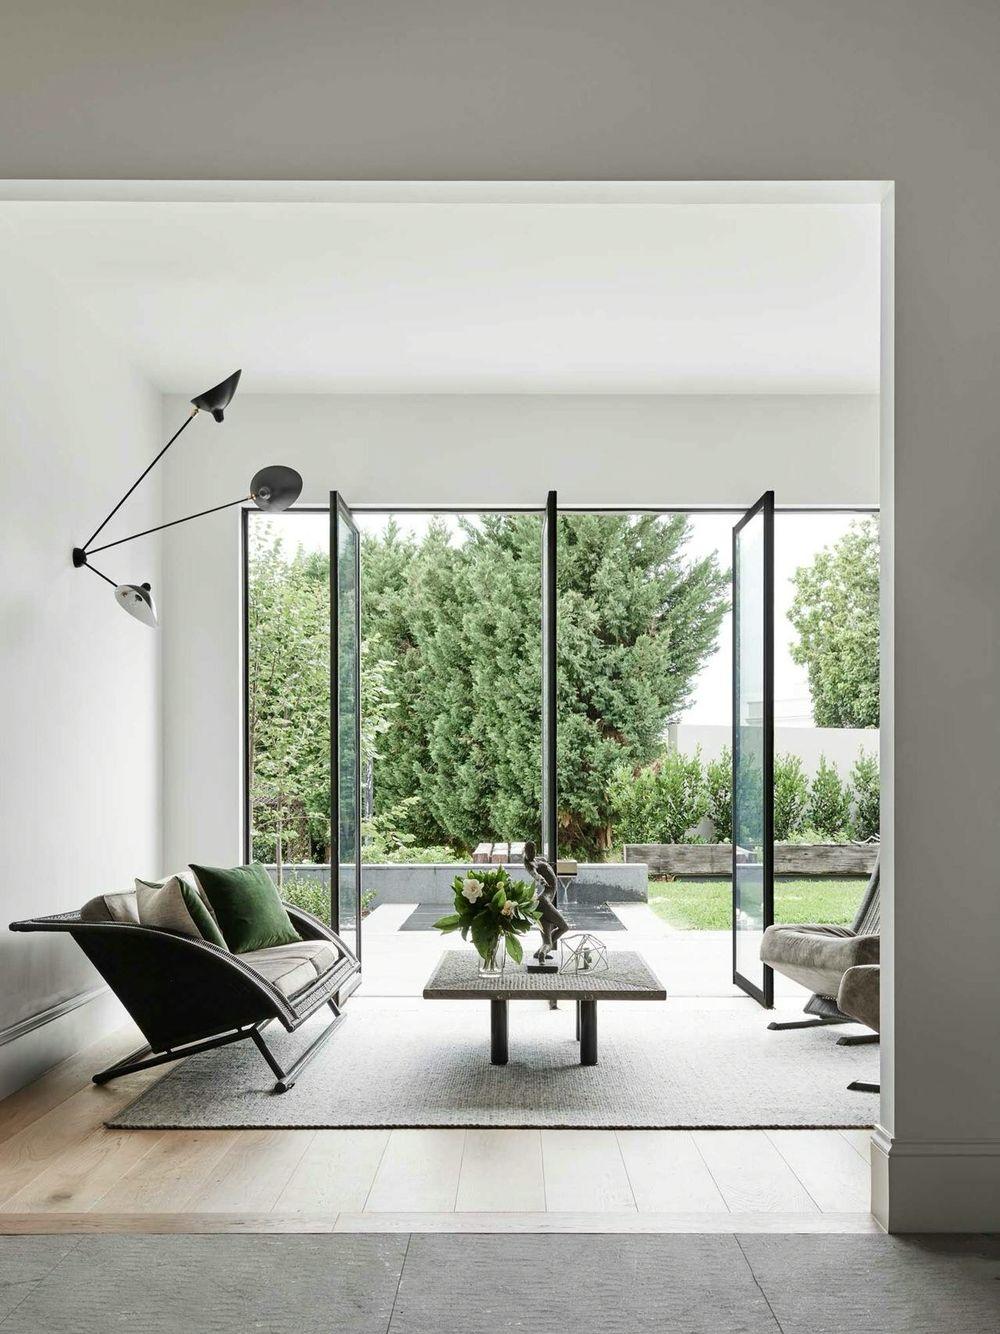 Glass Door Designs For Living Room Interesting Pinoscar Racso On Interieur & Huisjes  Pinterest  Living Design Inspiration